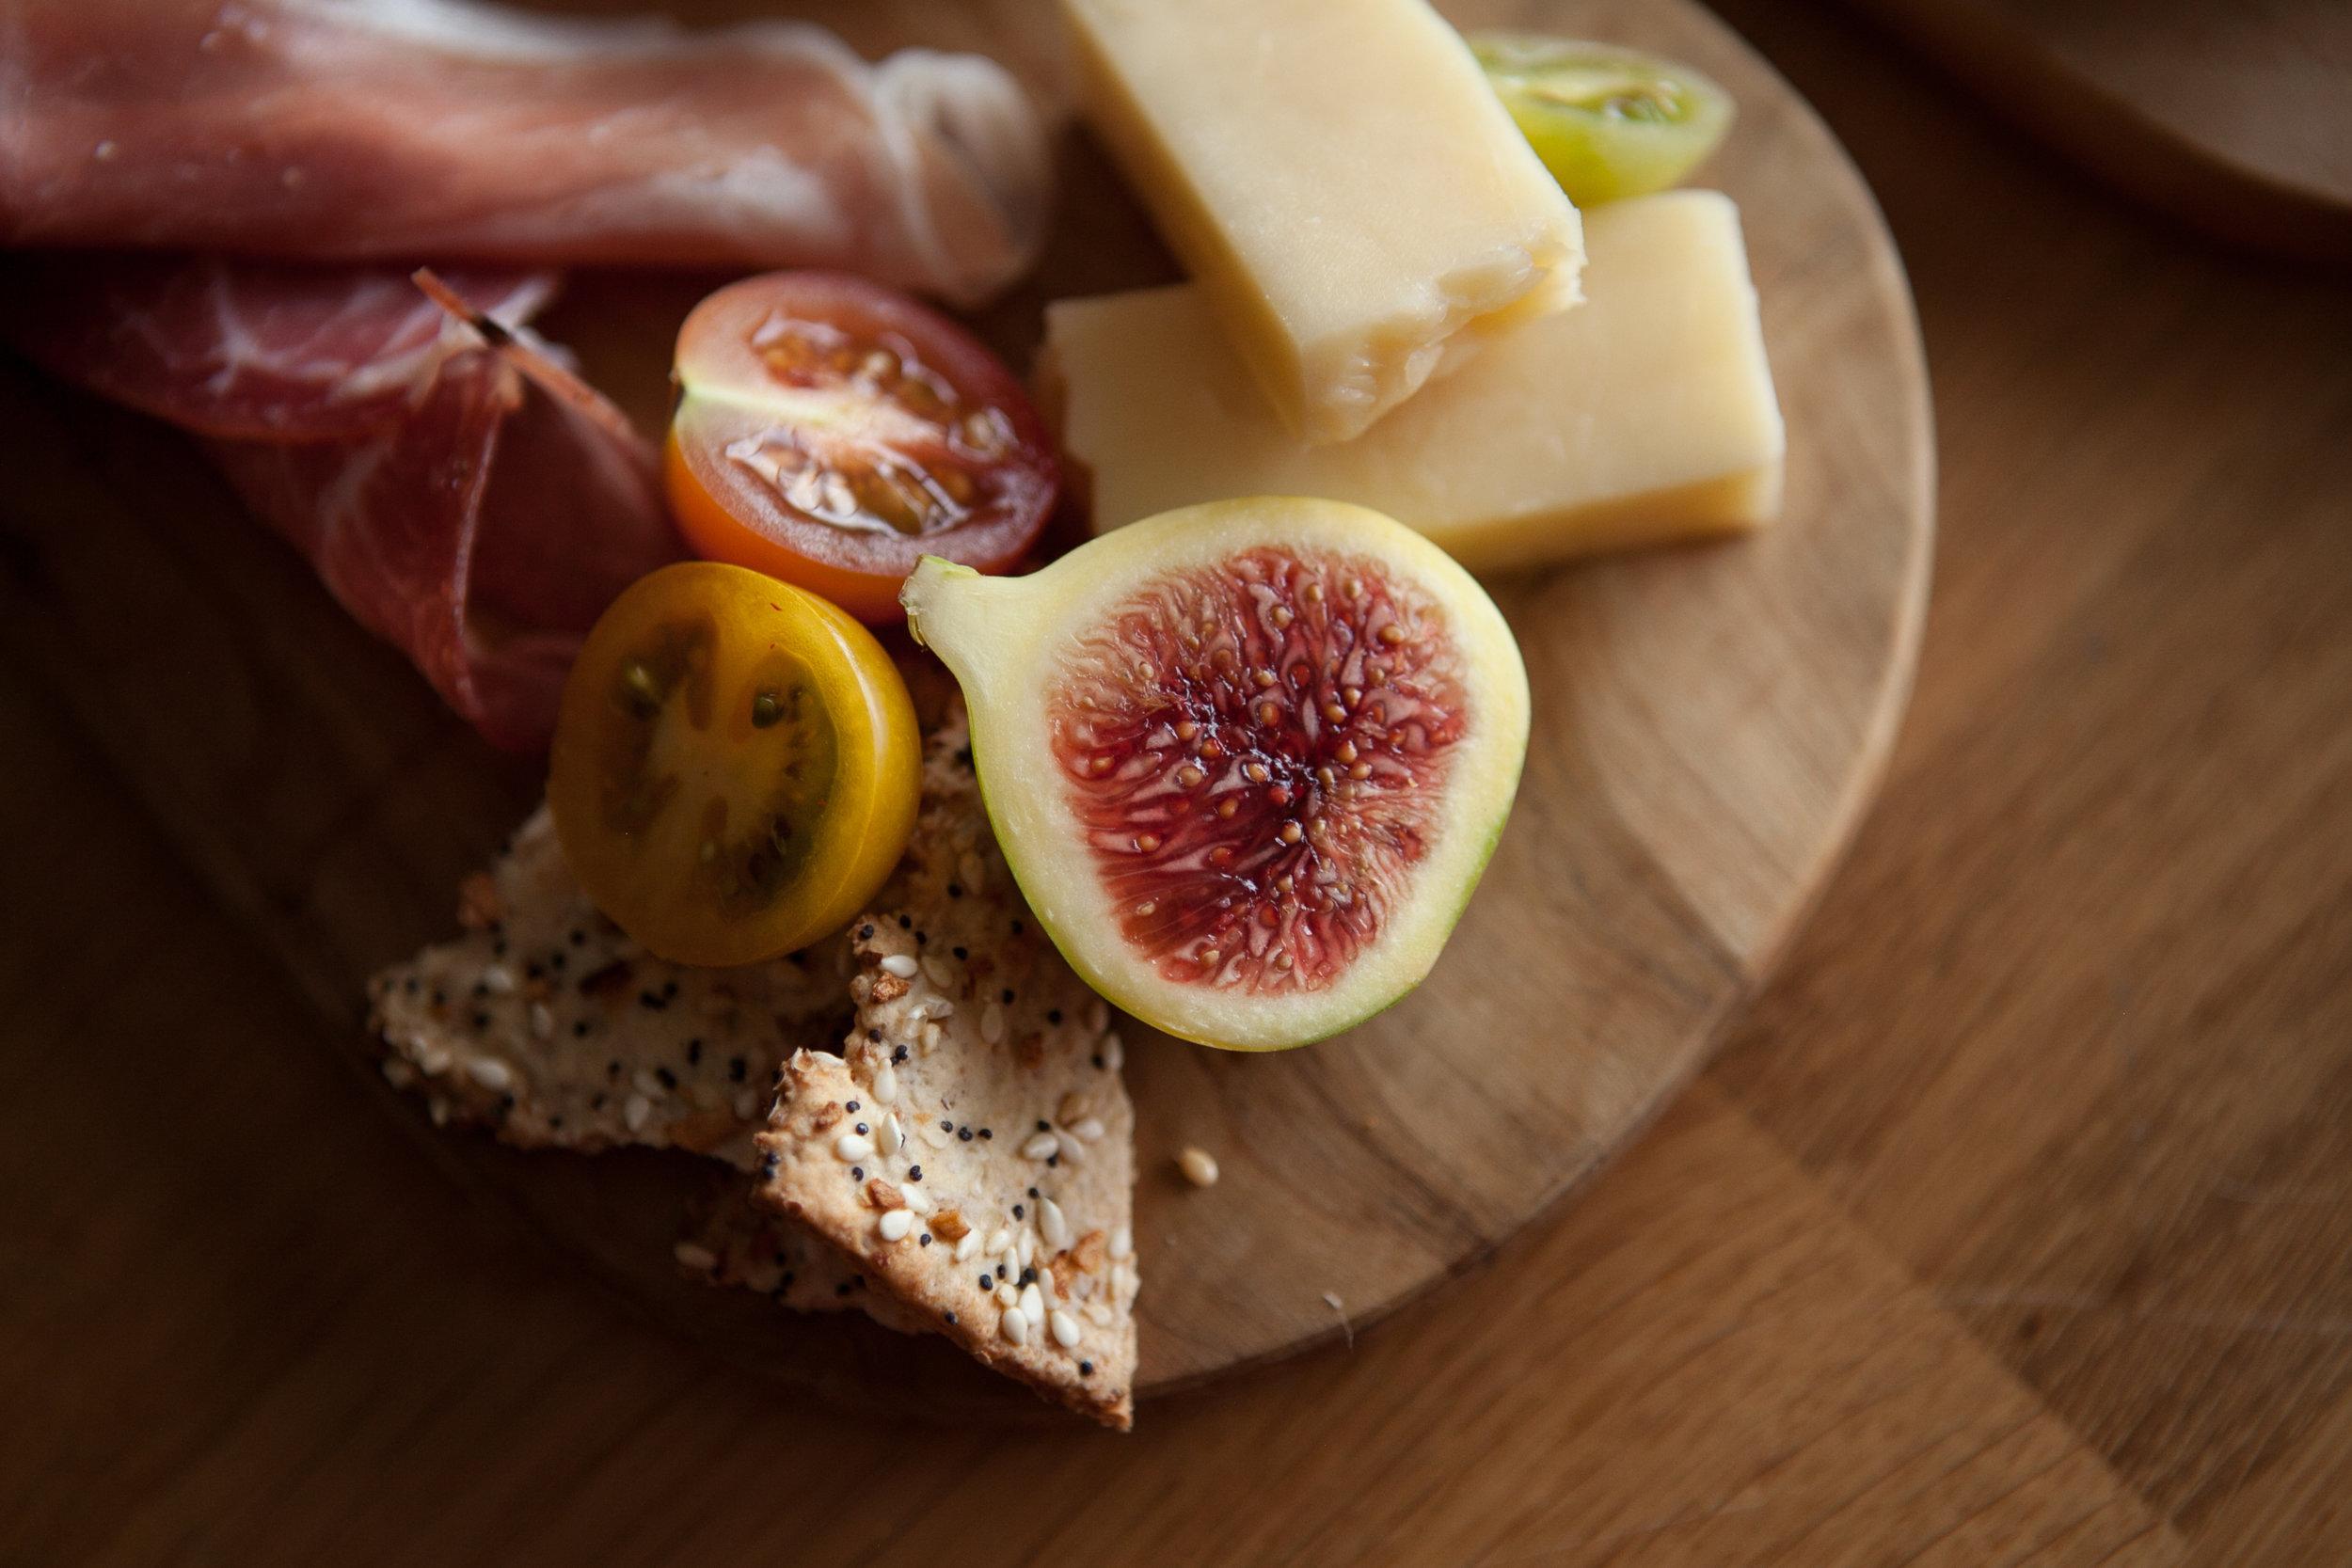 tampa-food-photographer-ablankplate-28.jpg